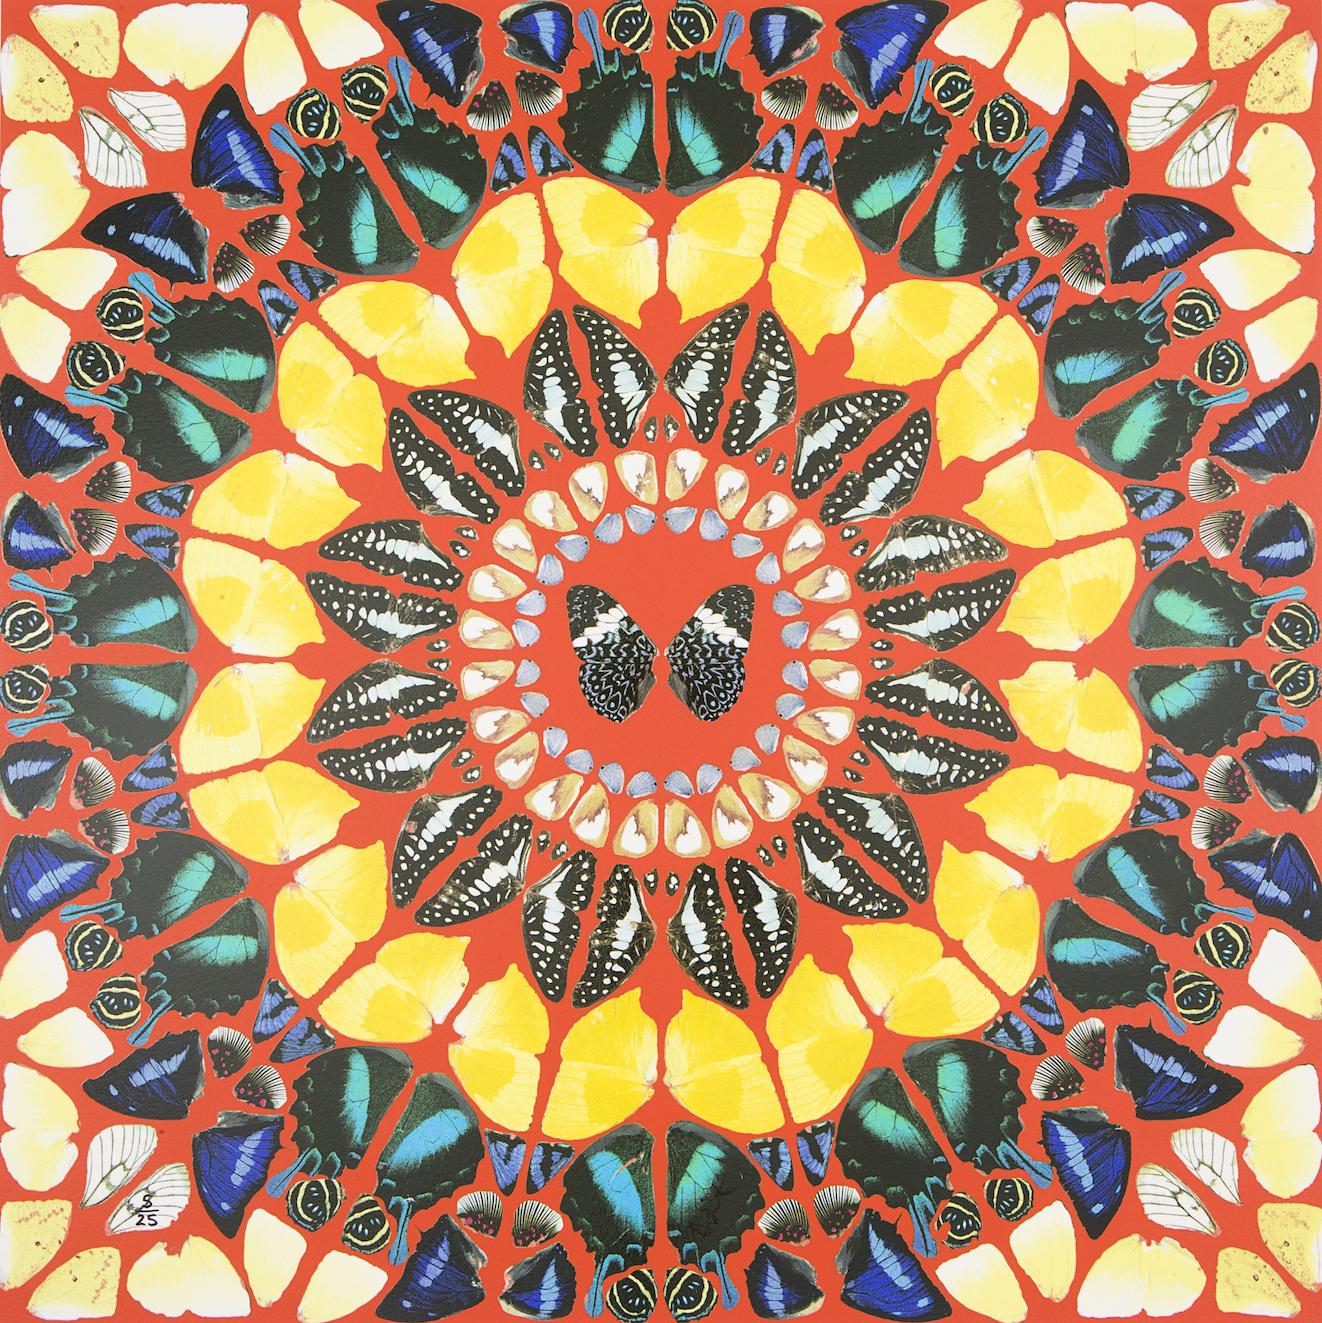 Psalm: Benedicam Domino by Damien Hirst